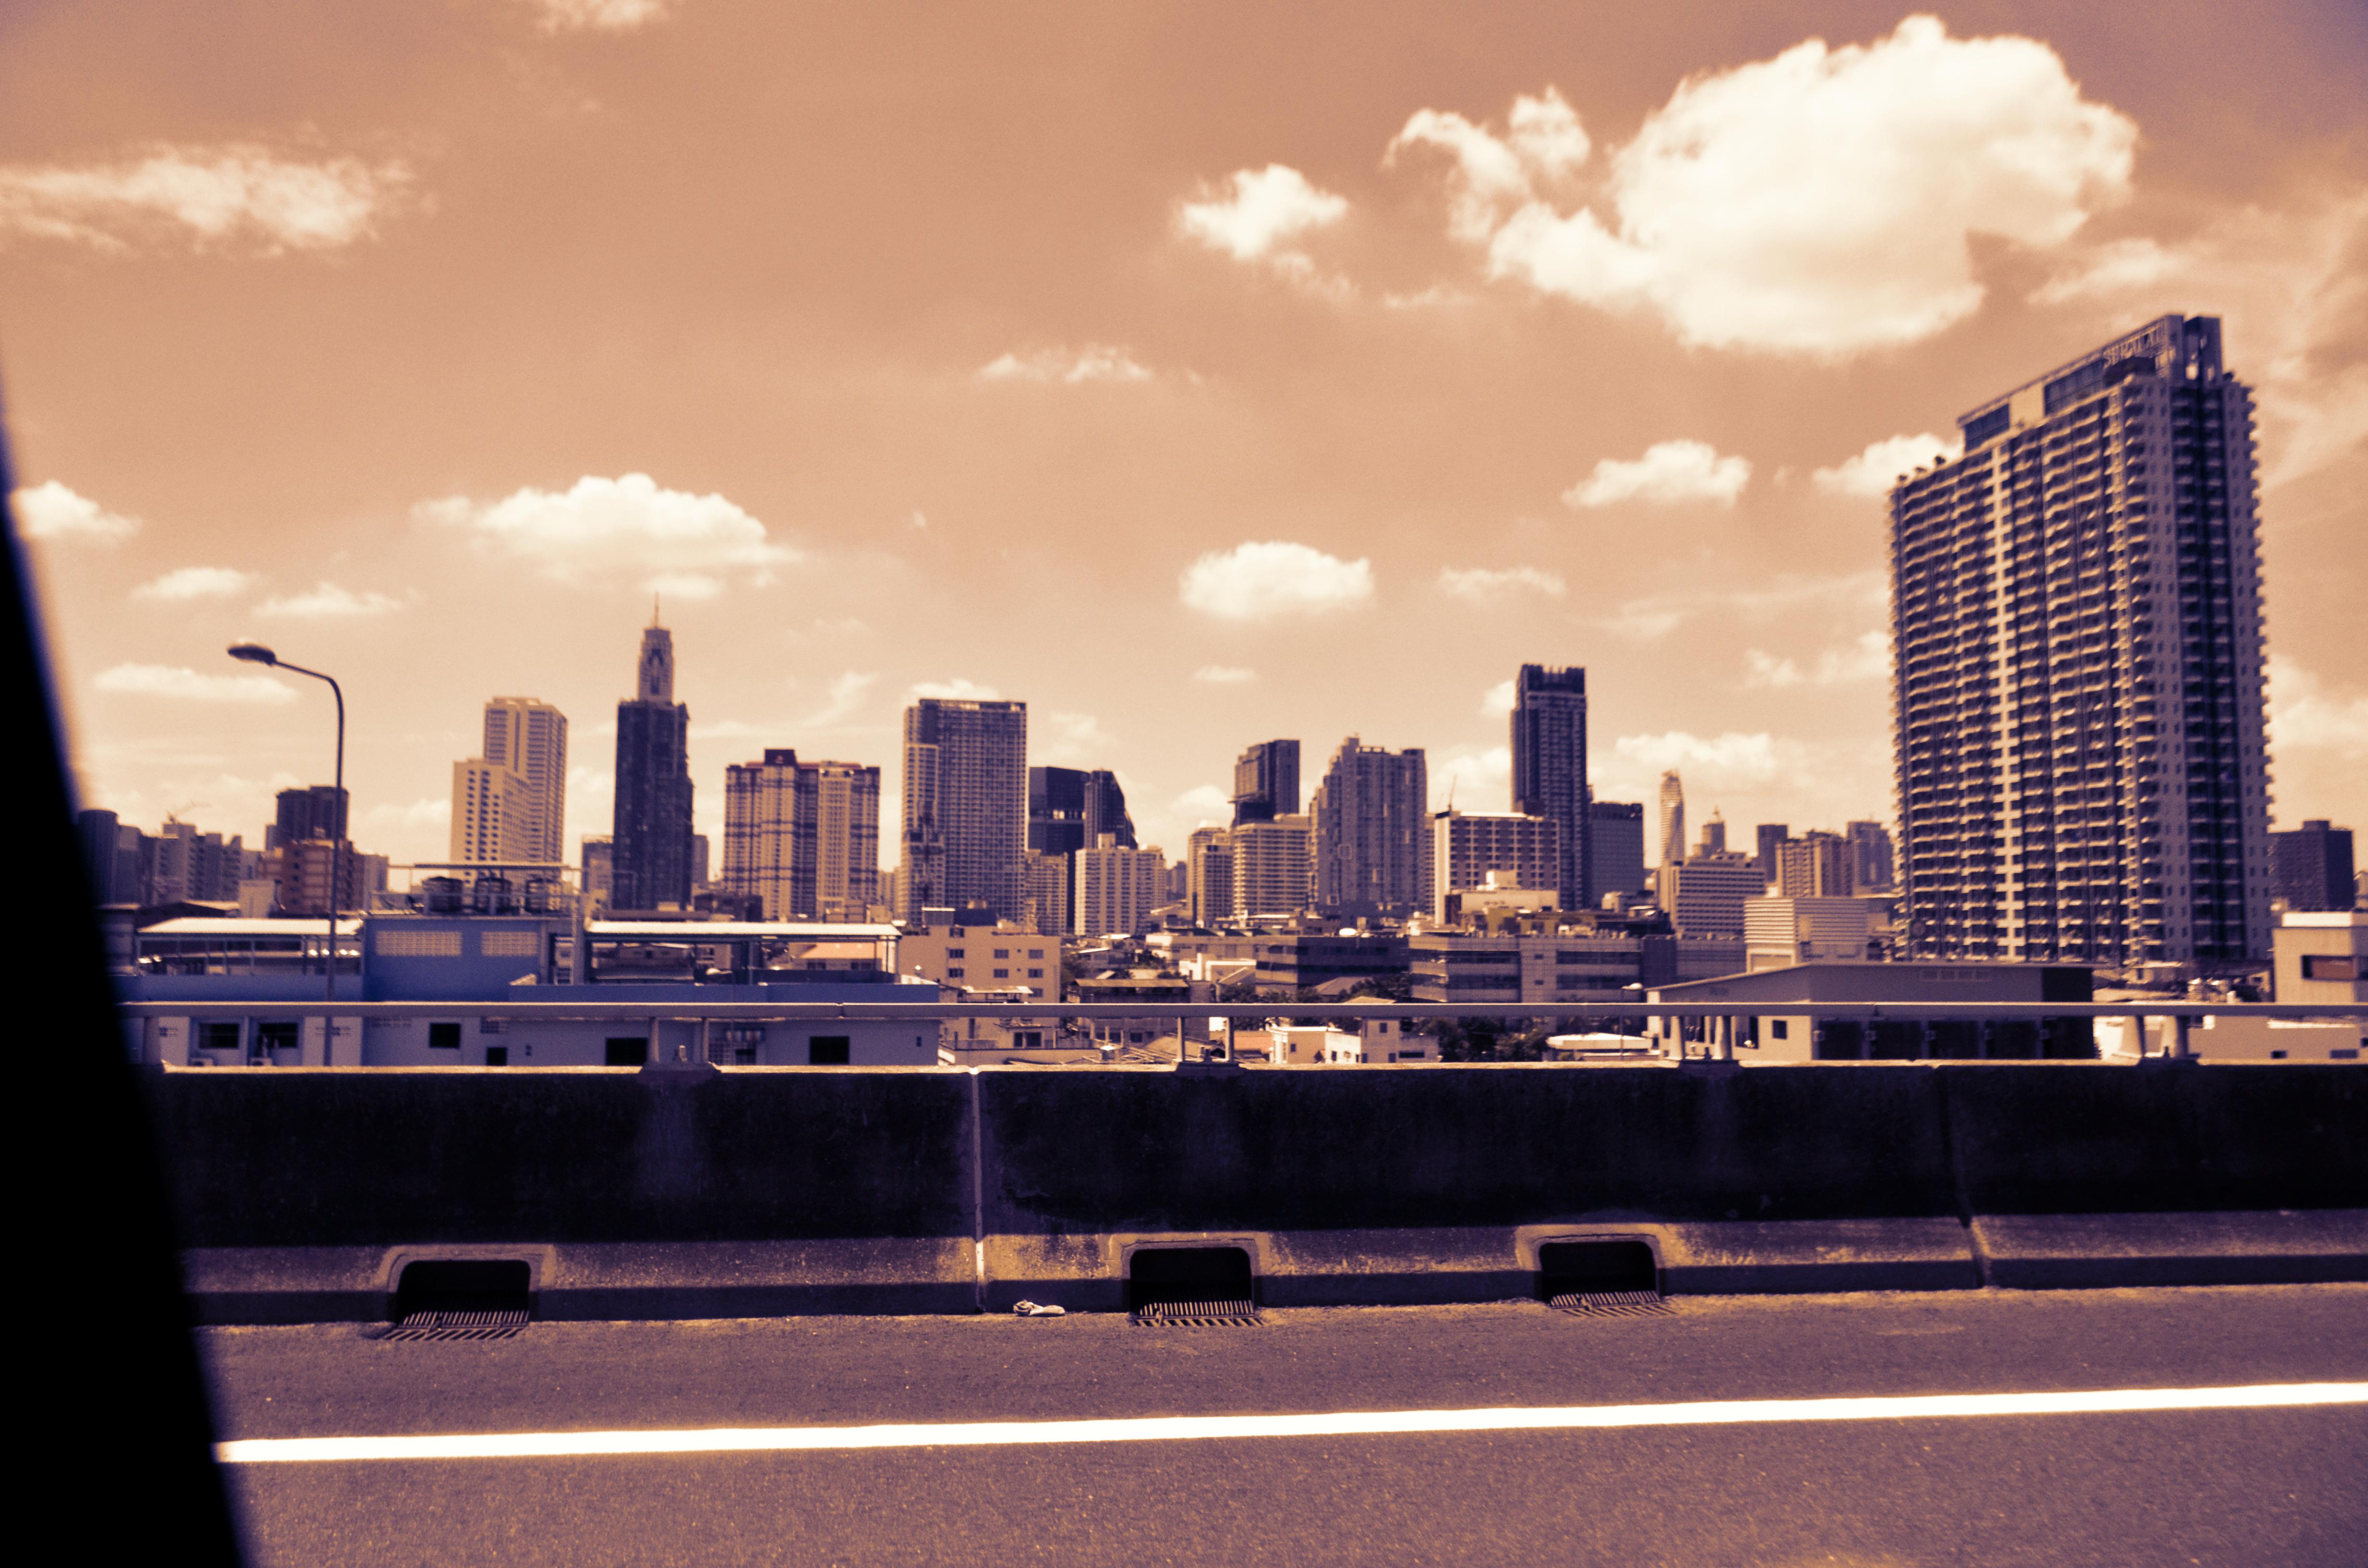 thailand, Bangkok city, thailand, Bangkok city